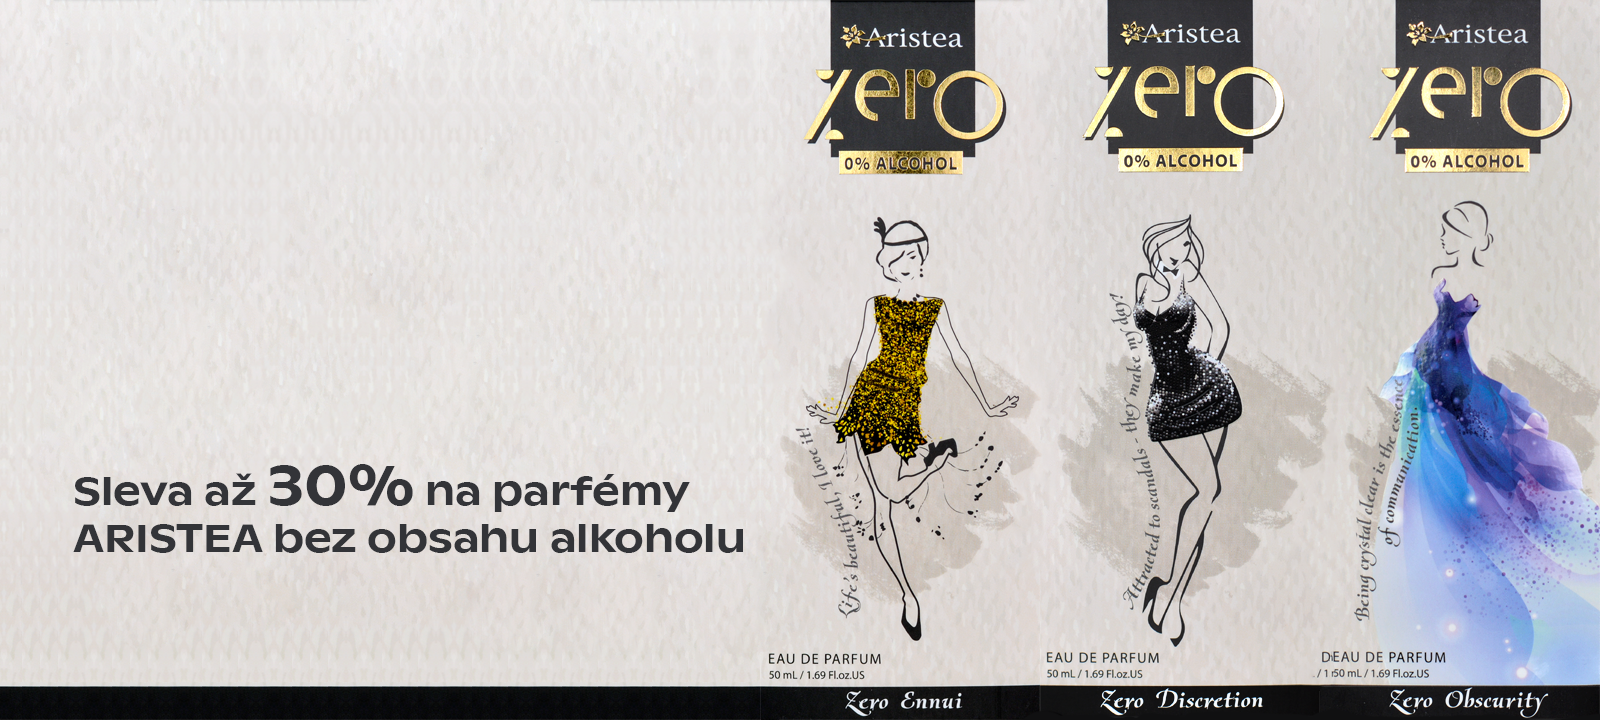 Sleva na parfémy Aristea ZERO